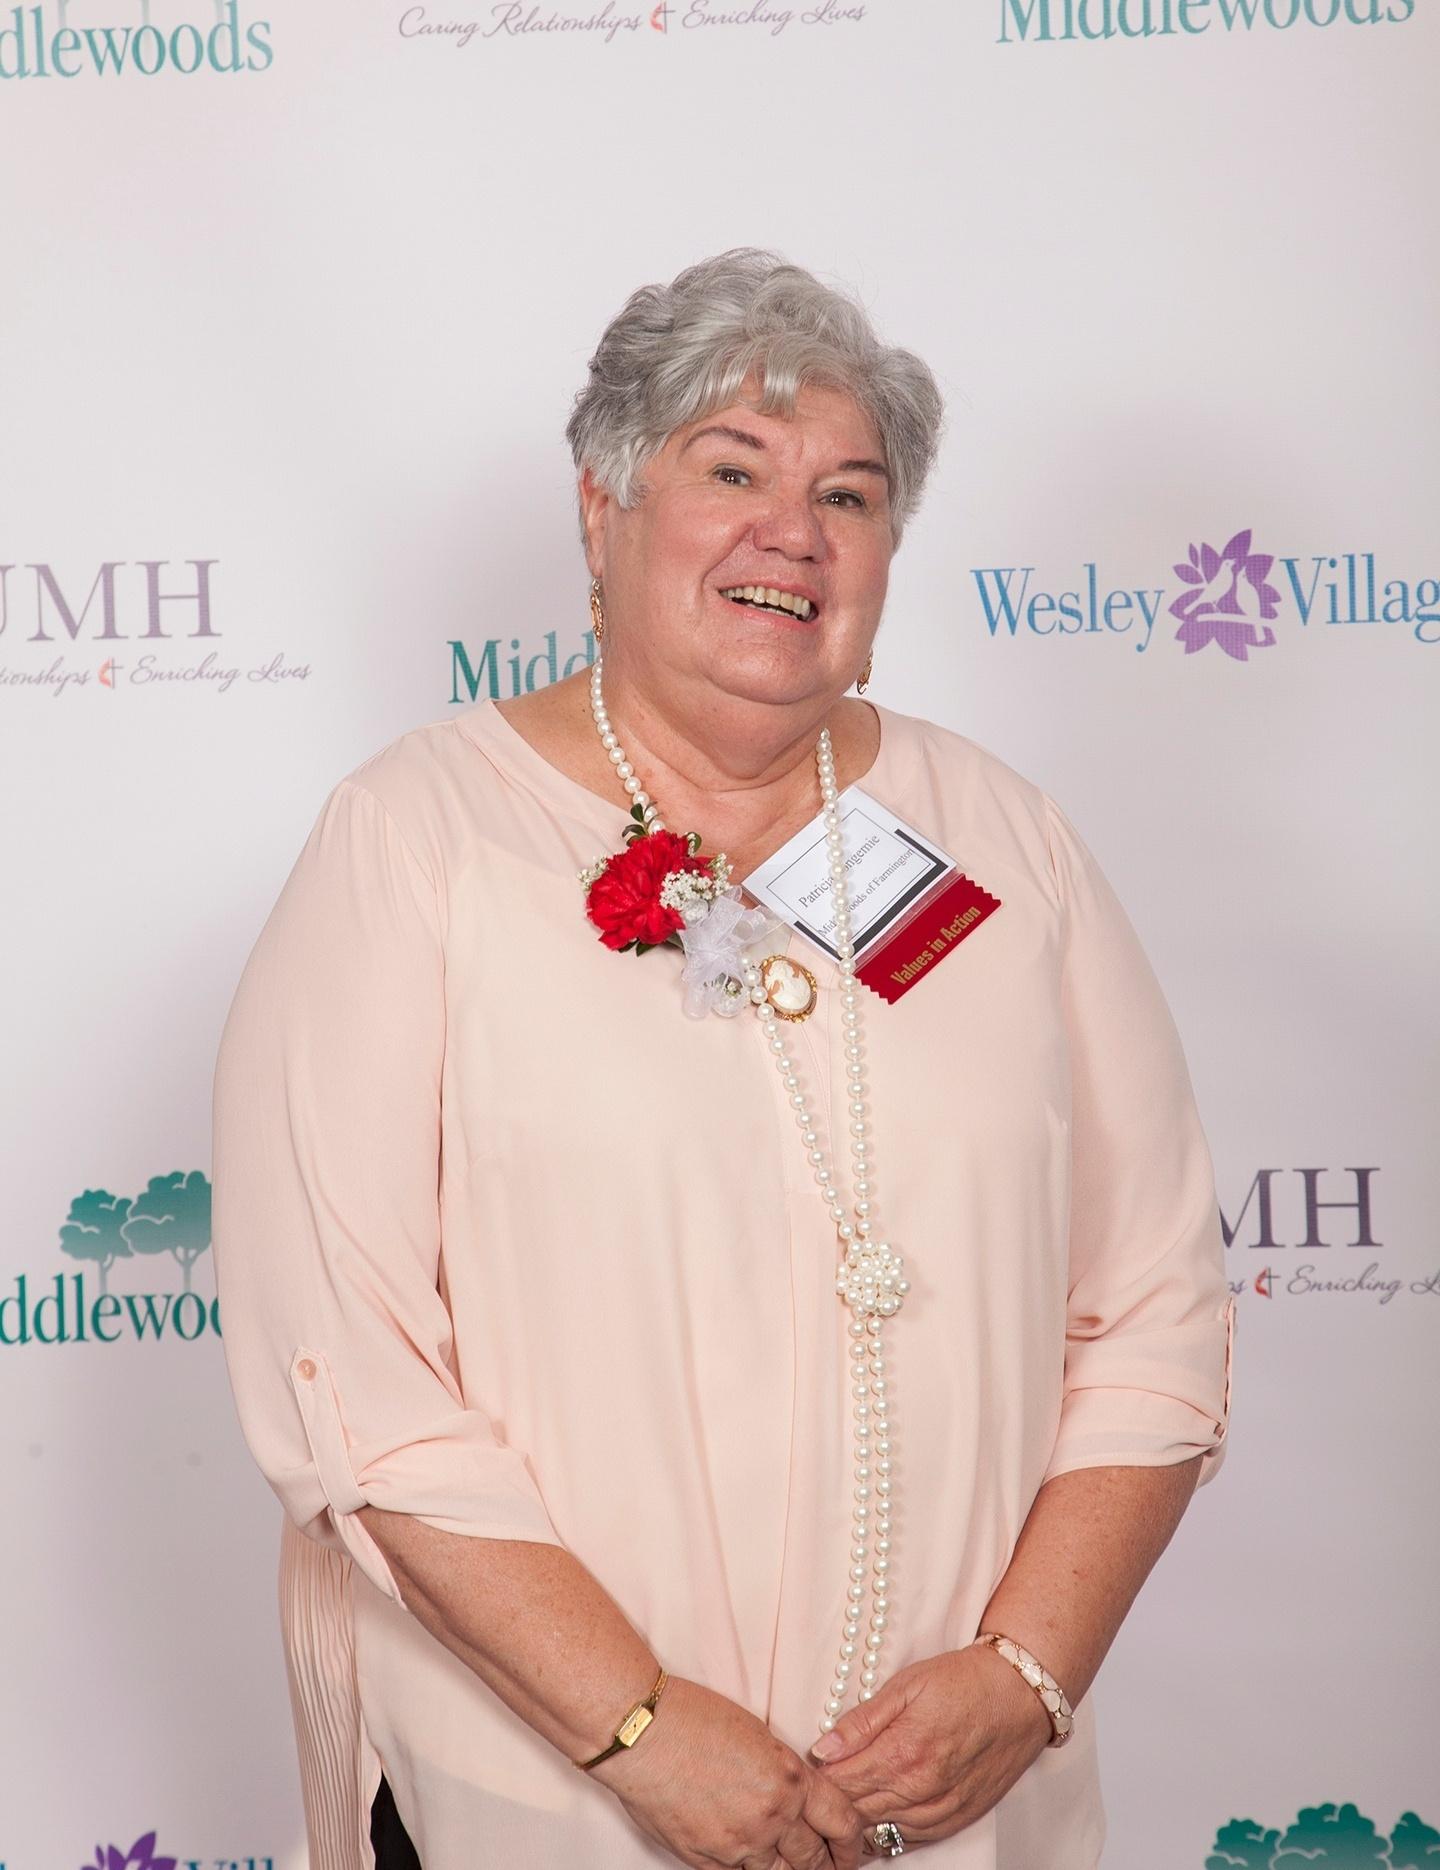 Patricia Fongemie, Wellness at Middlewoods of Farmington